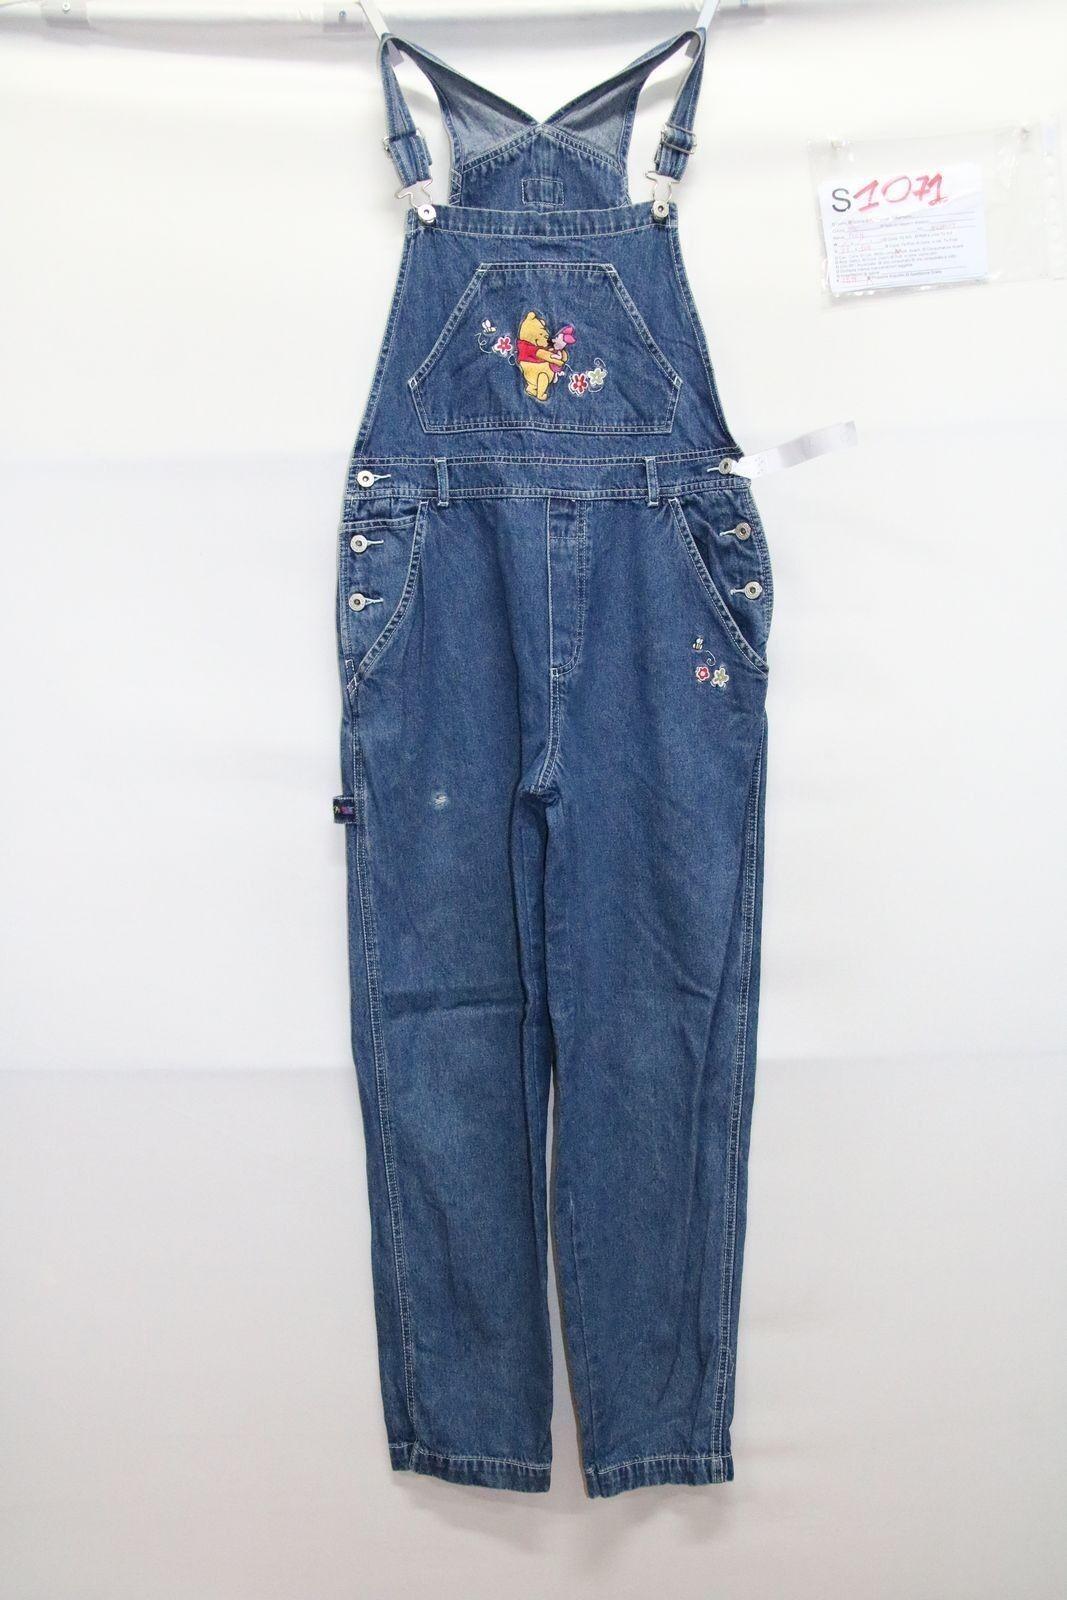 Dungarees Pooh ( Cod. S1071) TG M Jeans Used Vintage Streetwear Womens